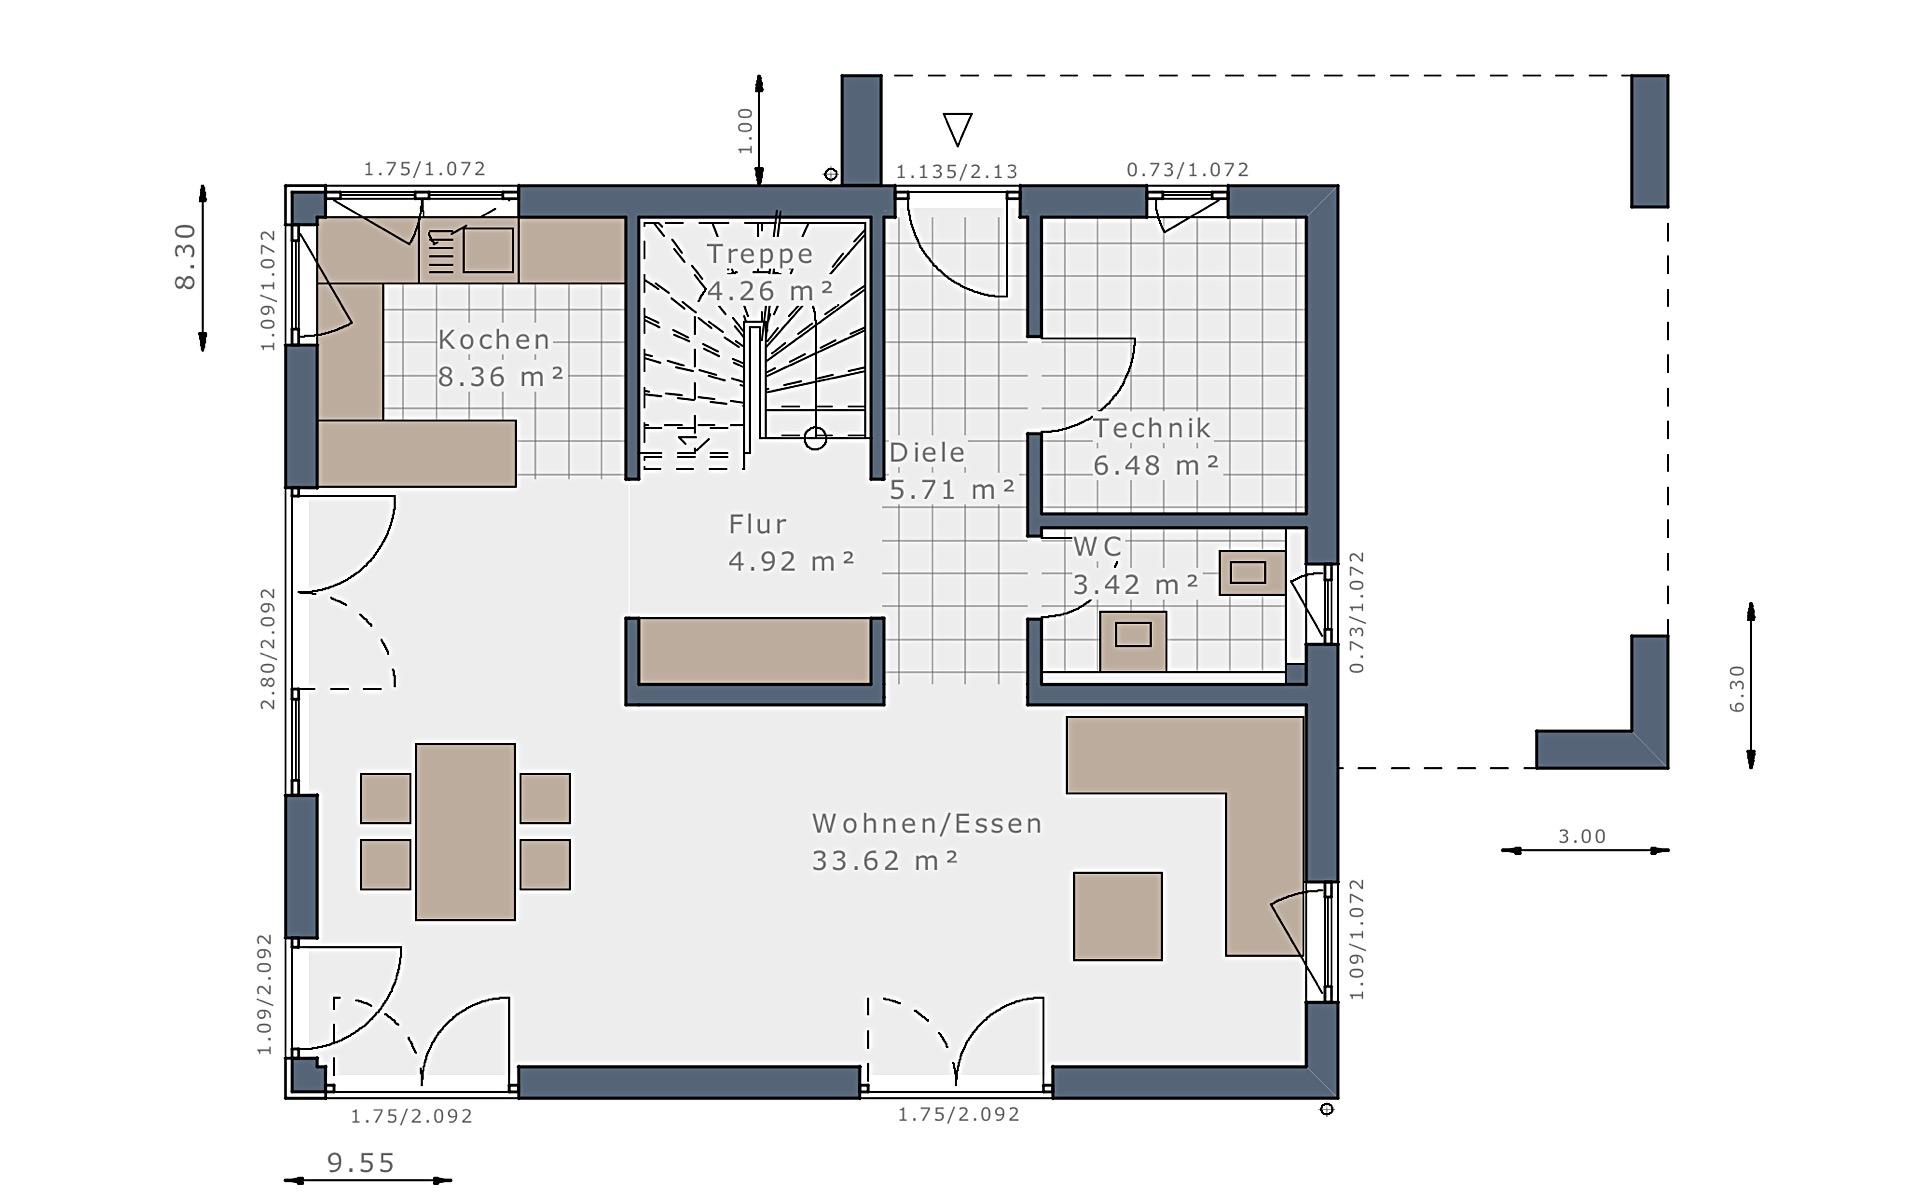 Erdgeschoss Sensation-E-132 E4 von Schwabenhaus GmbH & Co. KG